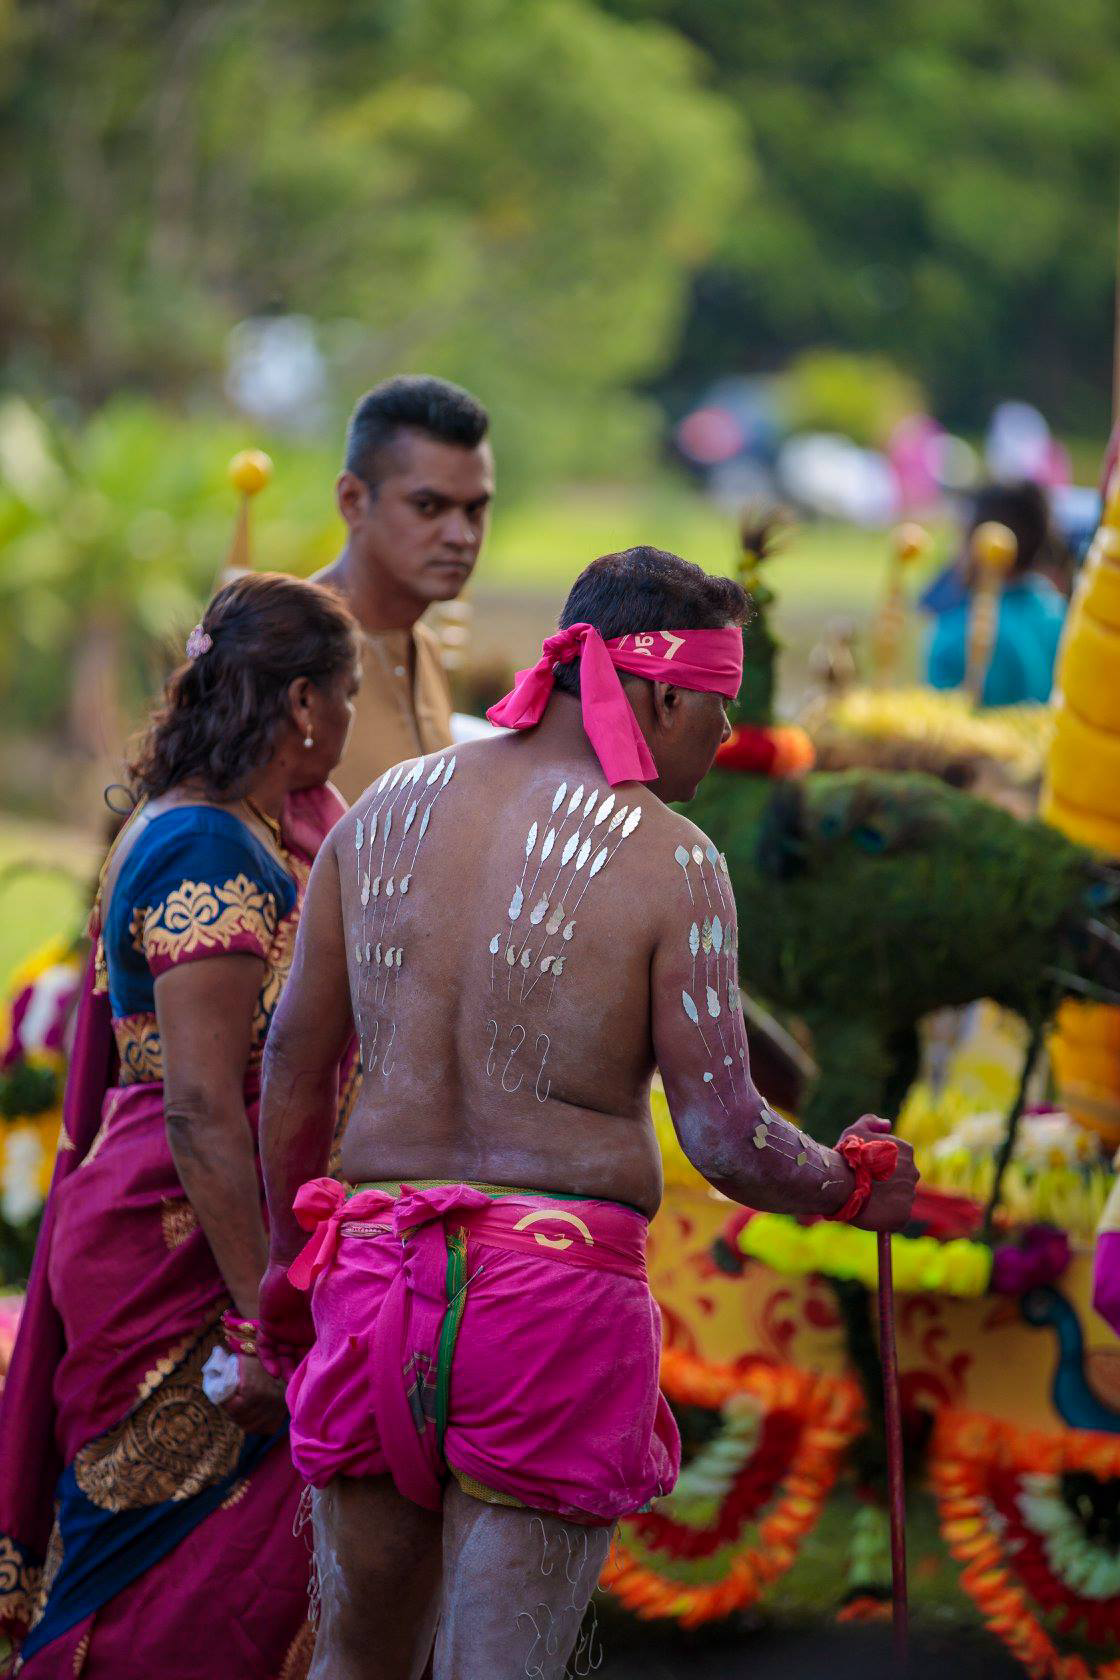 [Diaporama] Thaipoosam Cavadee célébré à Camp Caval, Plaines Wilhems